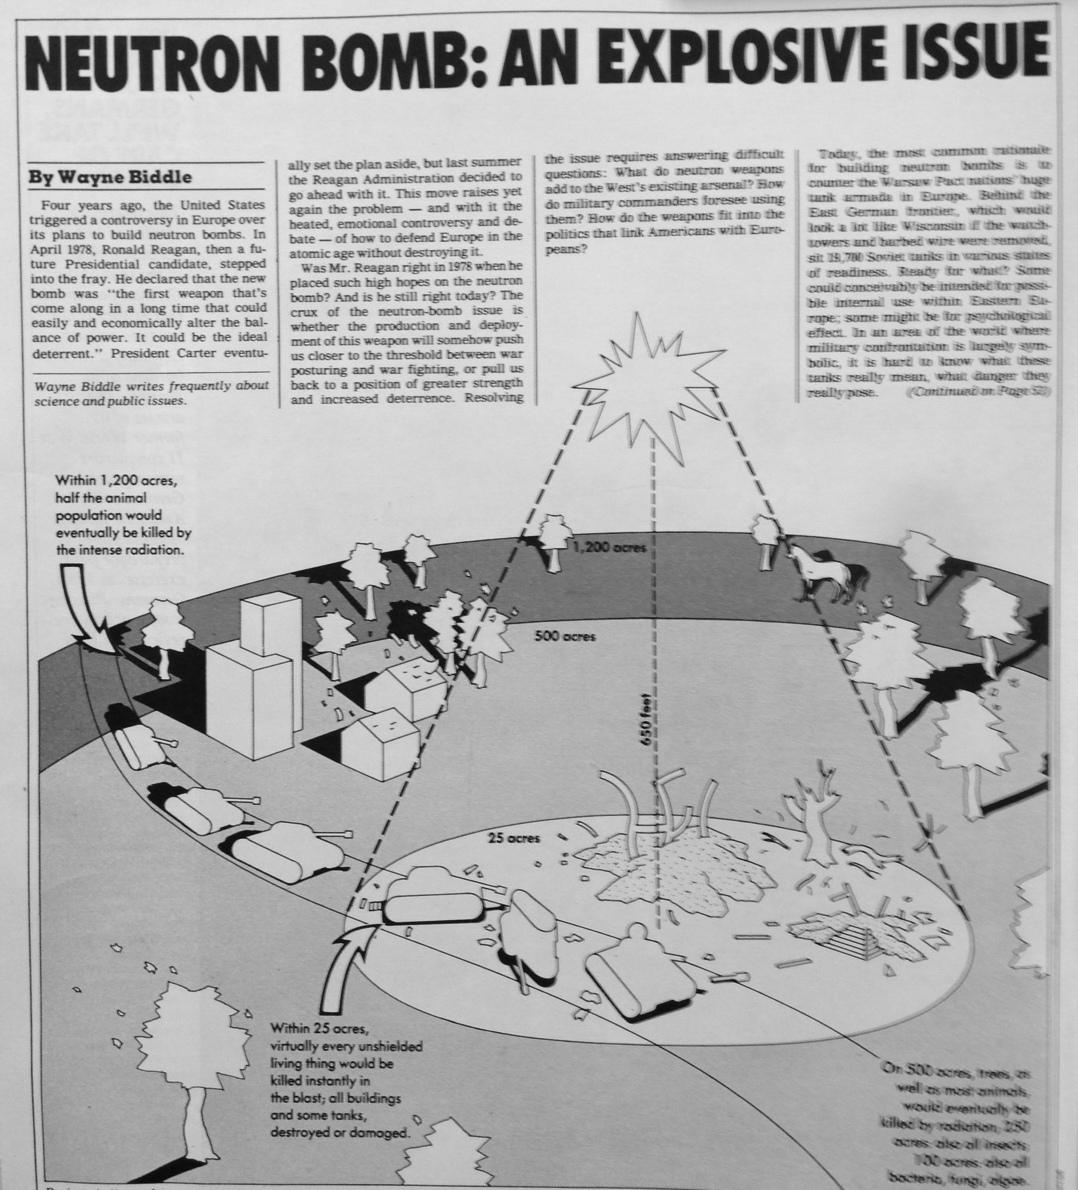 image neutron great multiverse wiki fandom powered by wikia. Black Bedroom Furniture Sets. Home Design Ideas